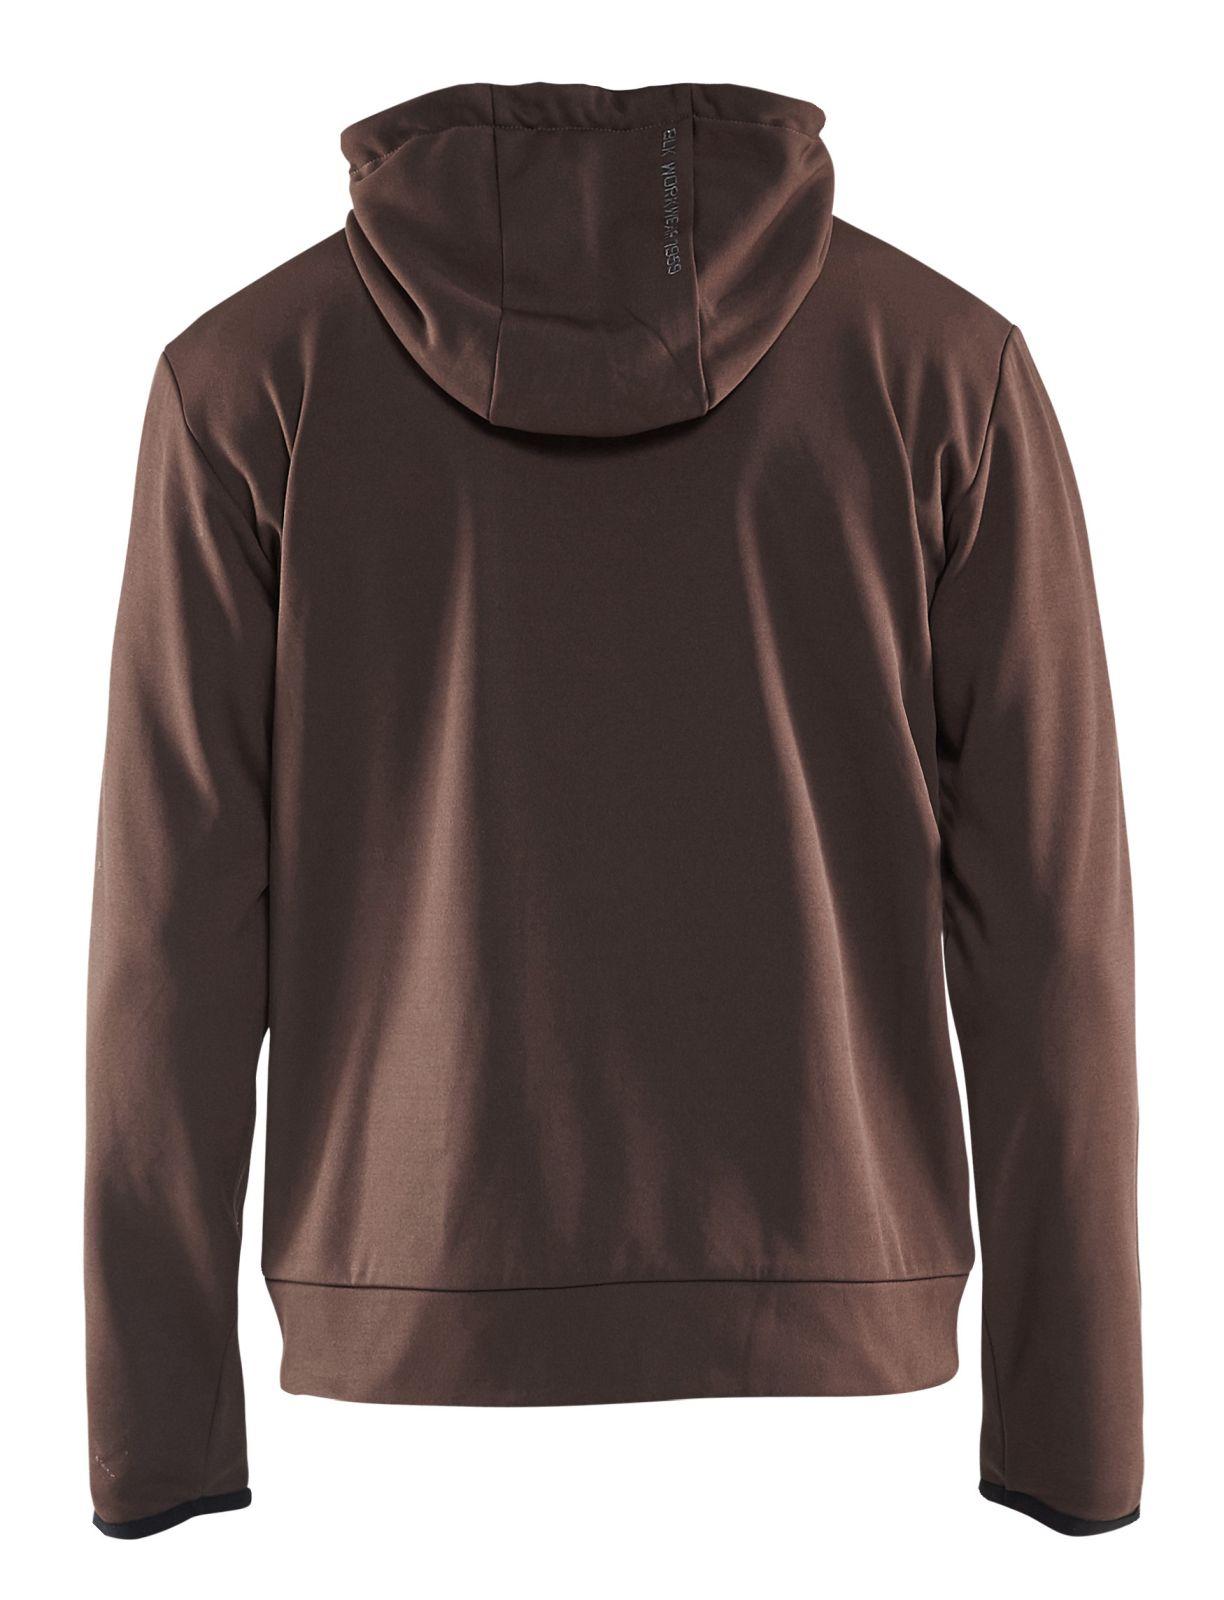 Blaklader Hooded sweatvesten 33632526 bruin-zwart(7899)